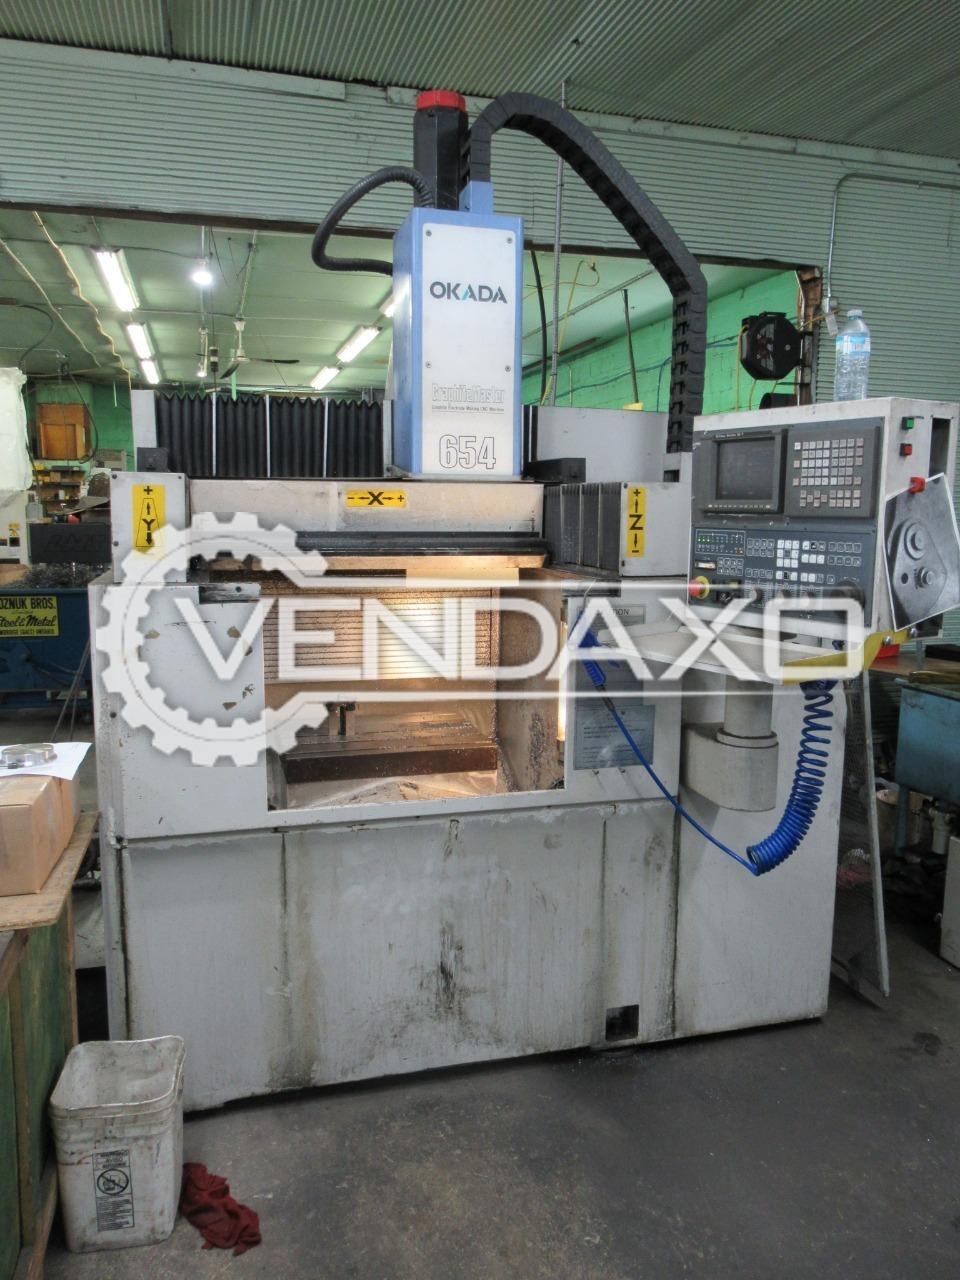 Okada GMC 654 CNC Vertical Machining Center VMC - Table Size - 600 x 500 mm